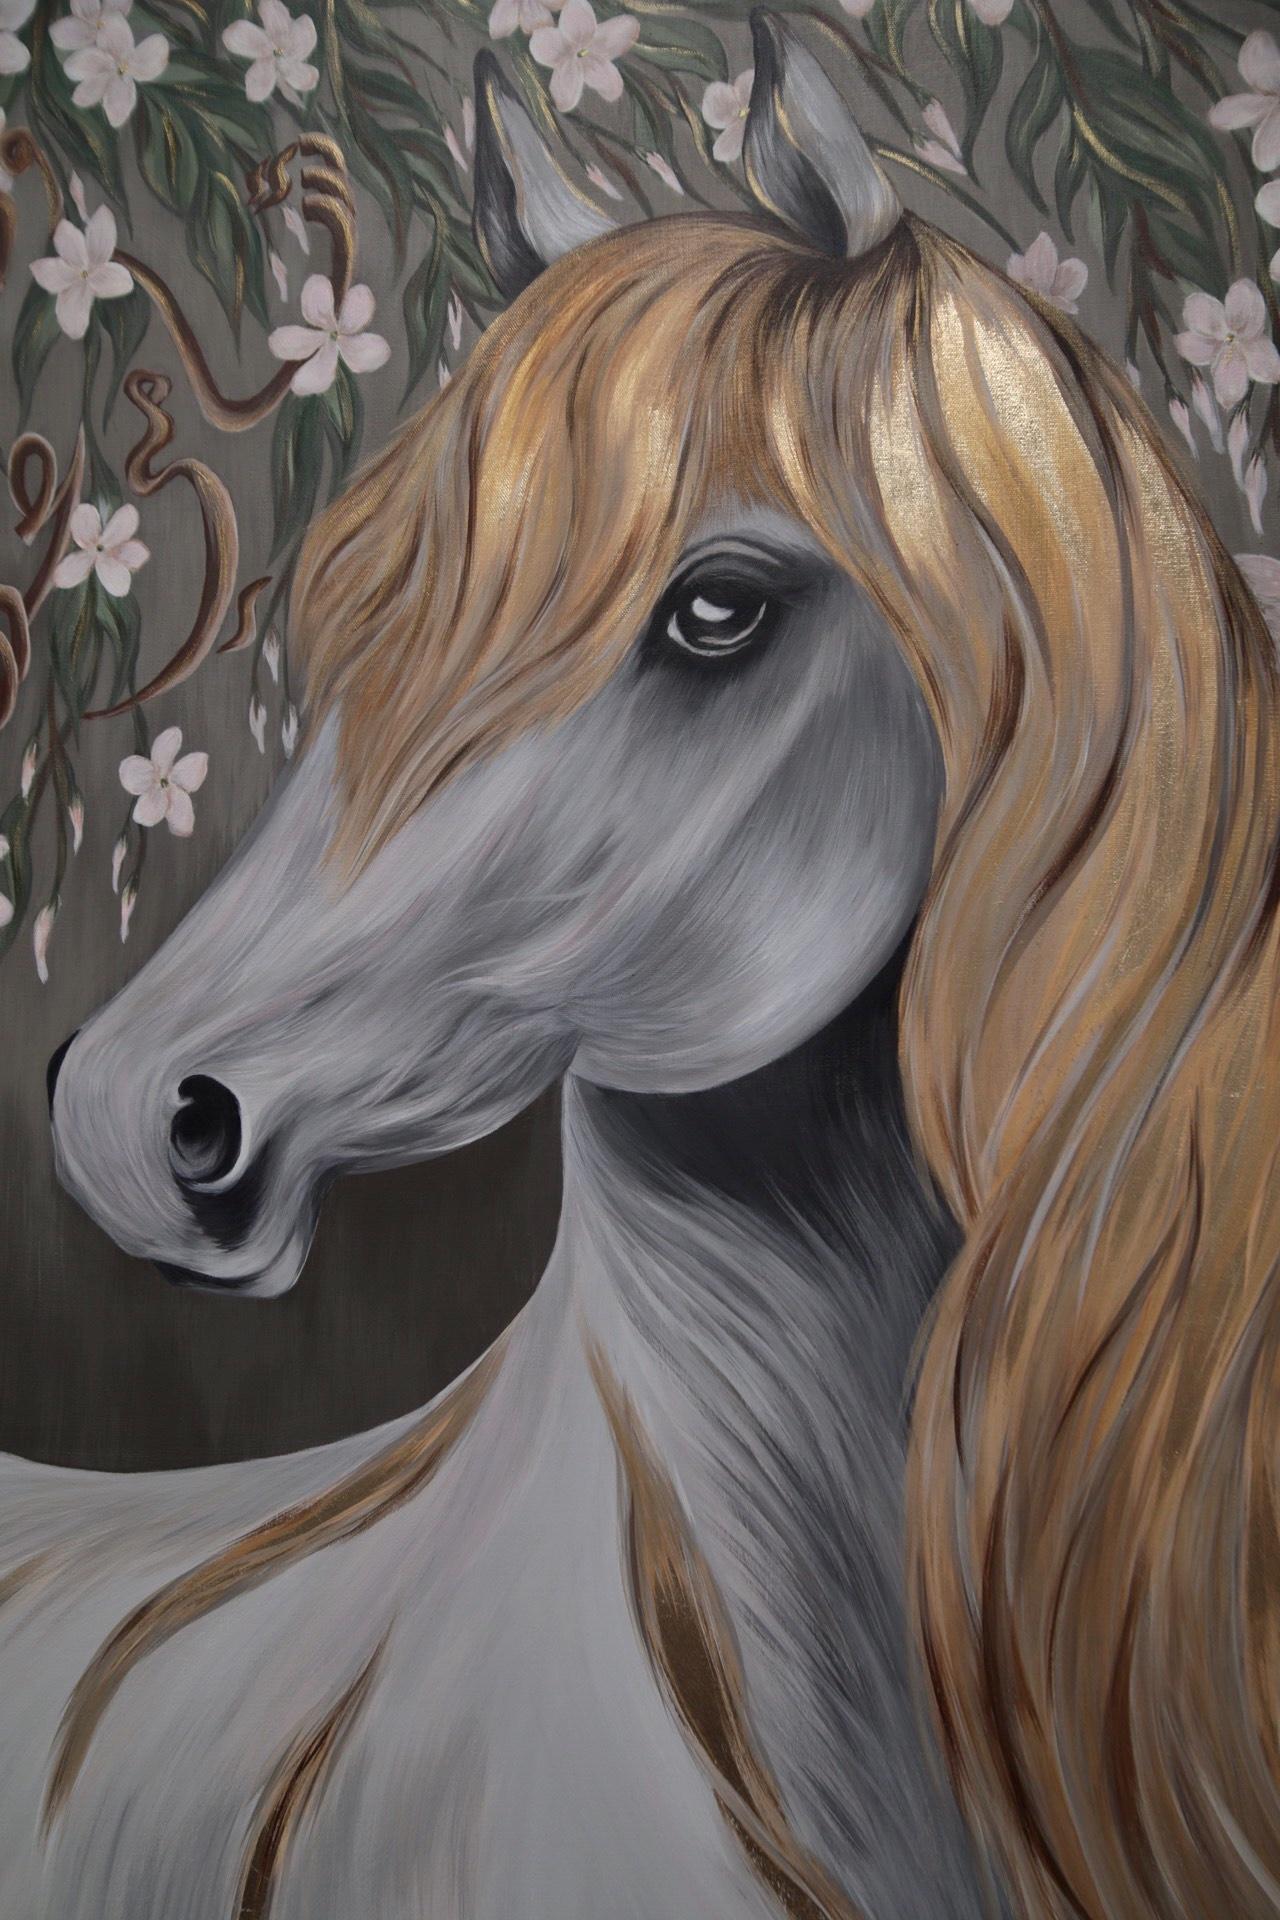 The Arabian Horse 1 by Sonia Breik.